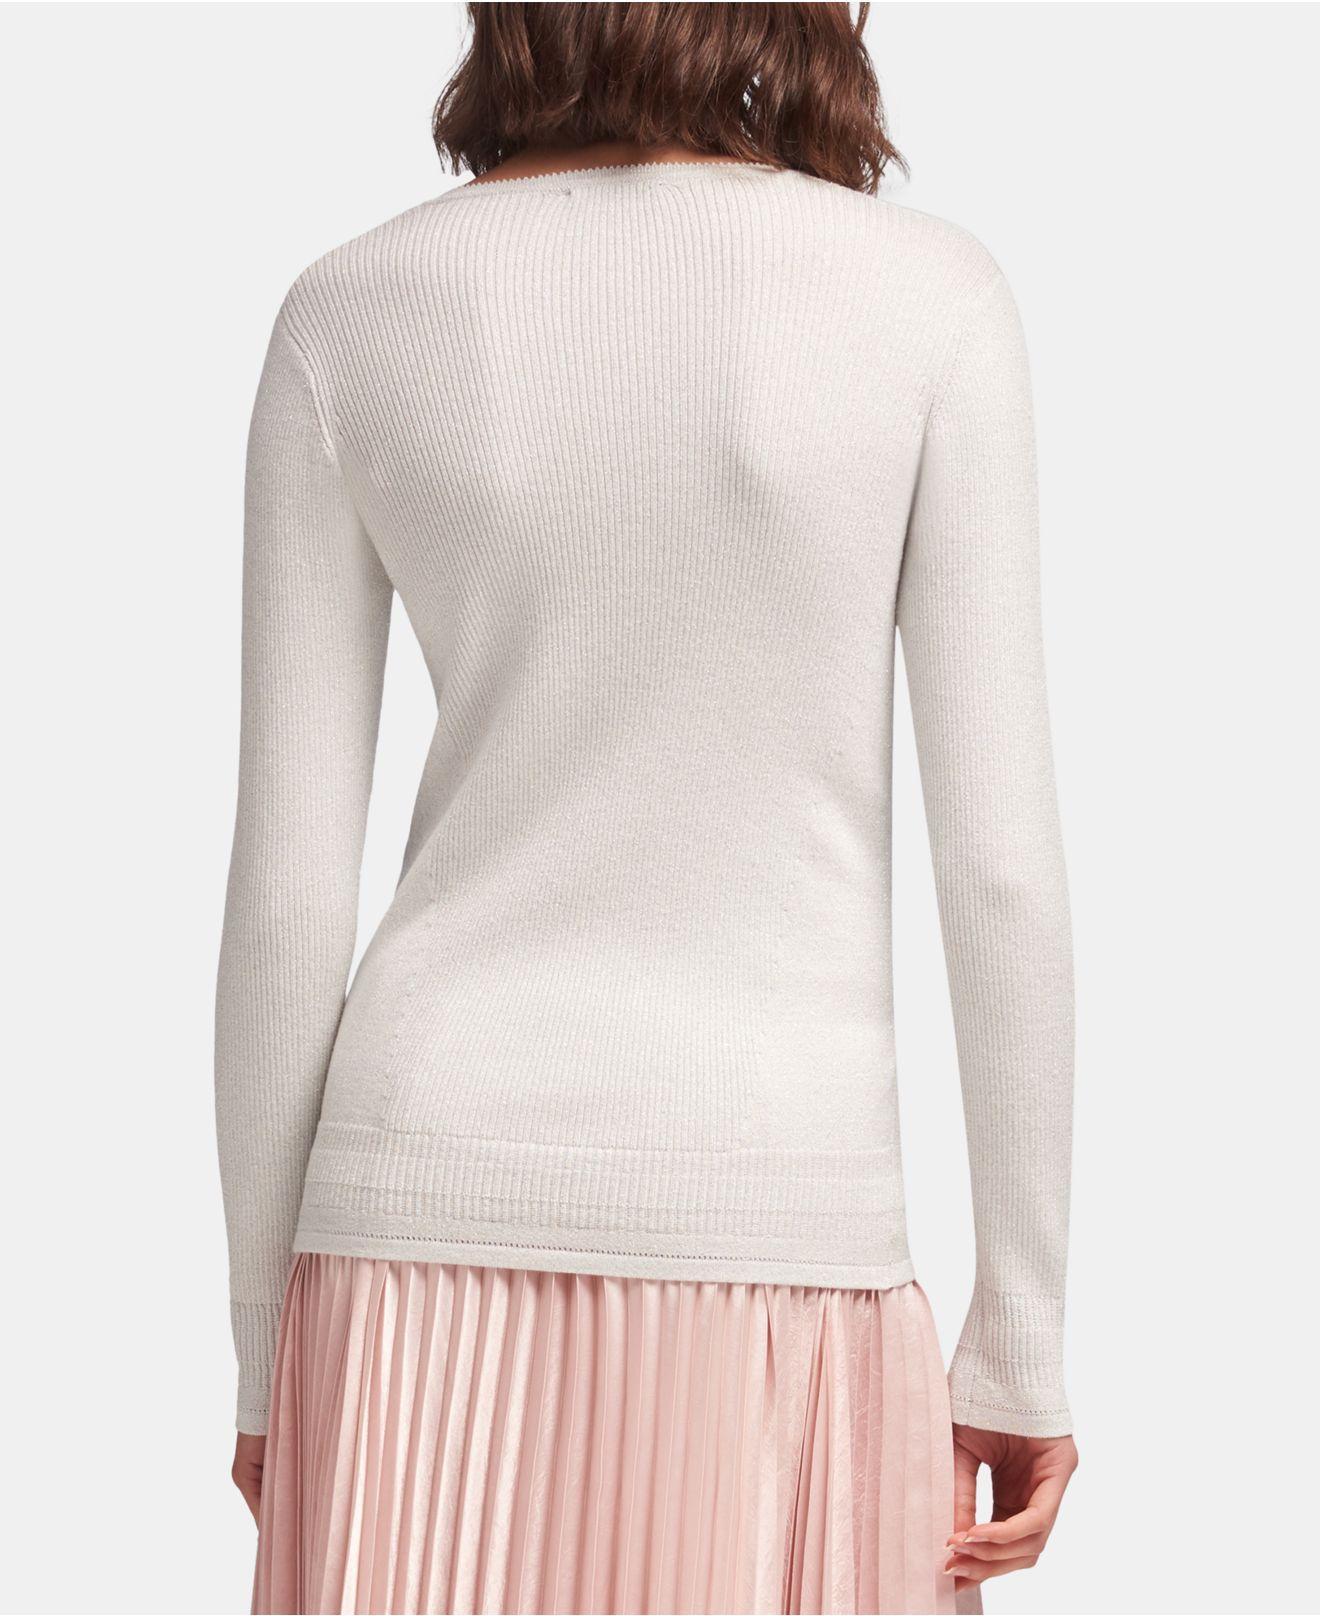 8d4717dd76a Lyst - DKNY Rhinestone V-neck Sweater in White